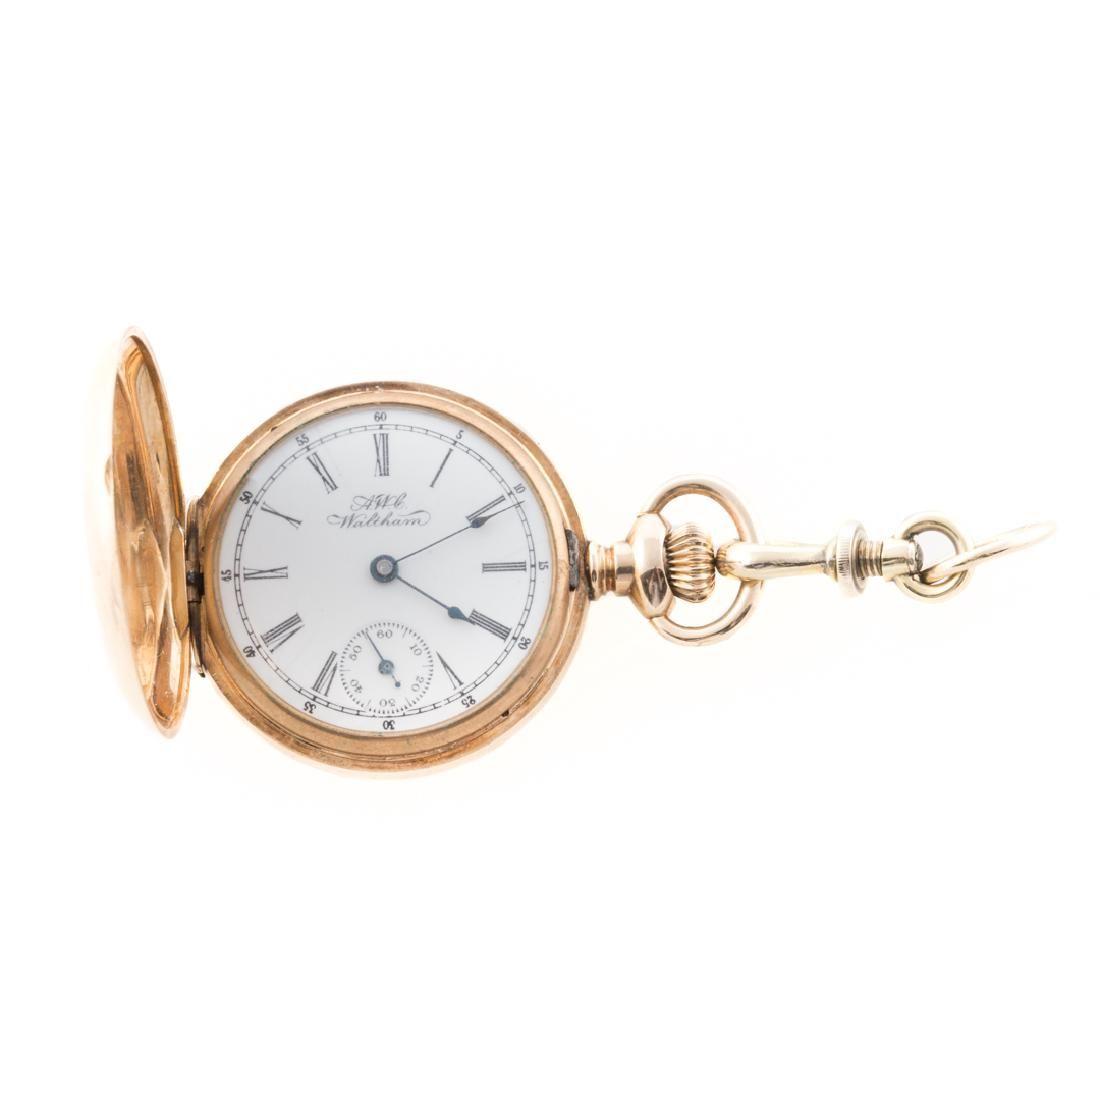 A Lady's 14K Waltham Pocket Watch with Hunter Case